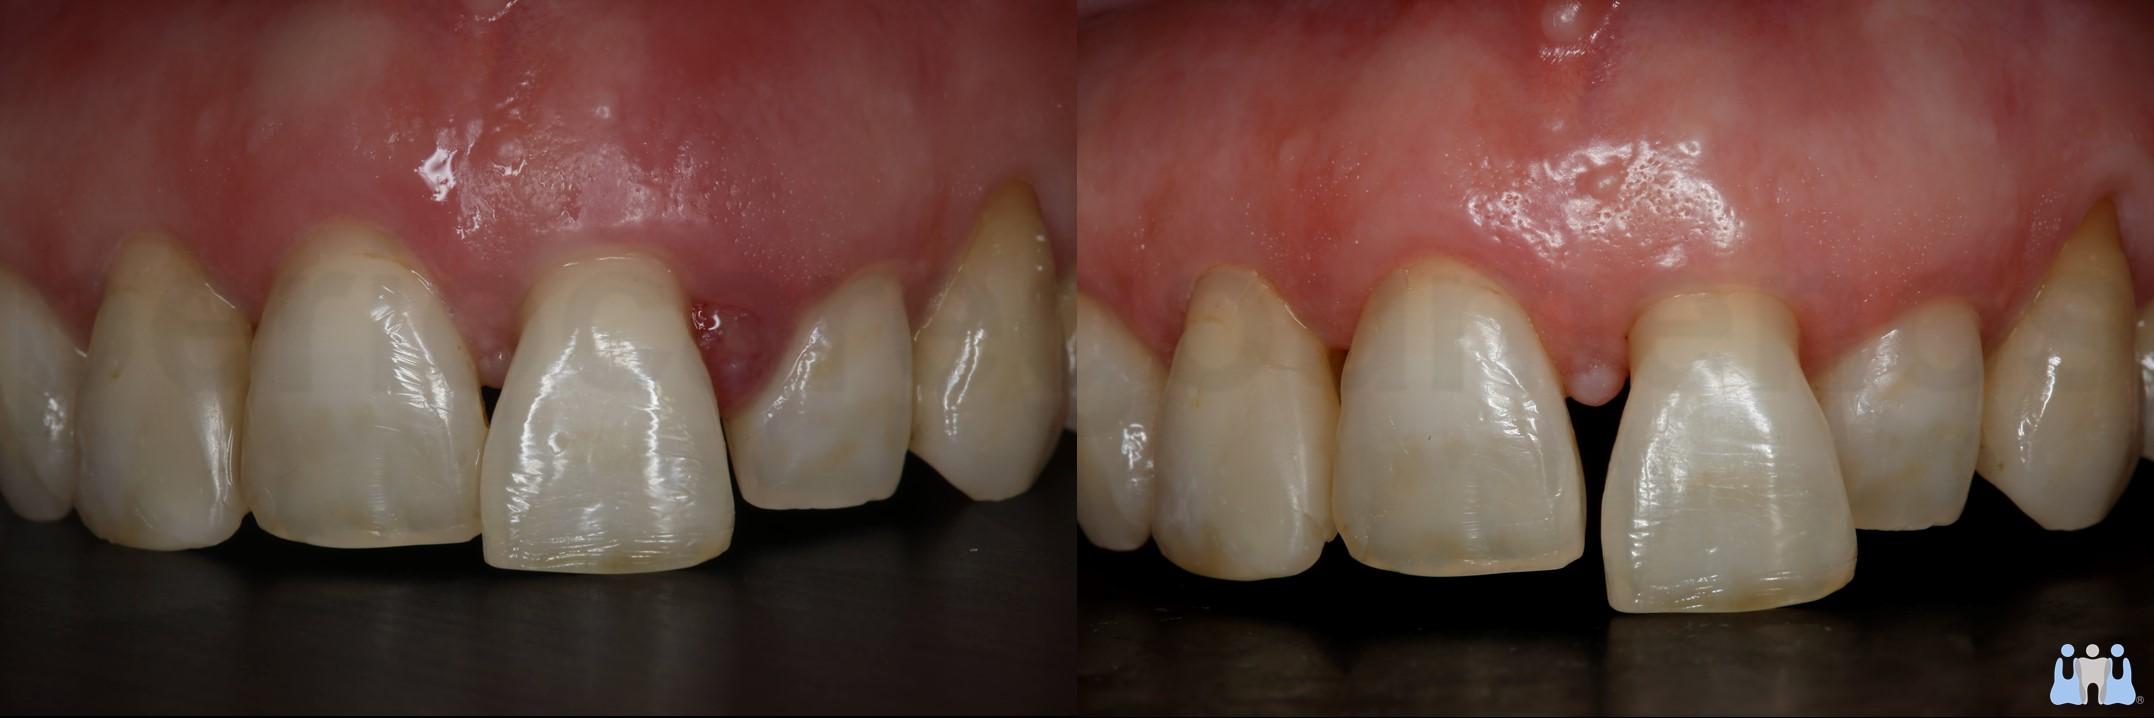 Contemporary periodontal treatment